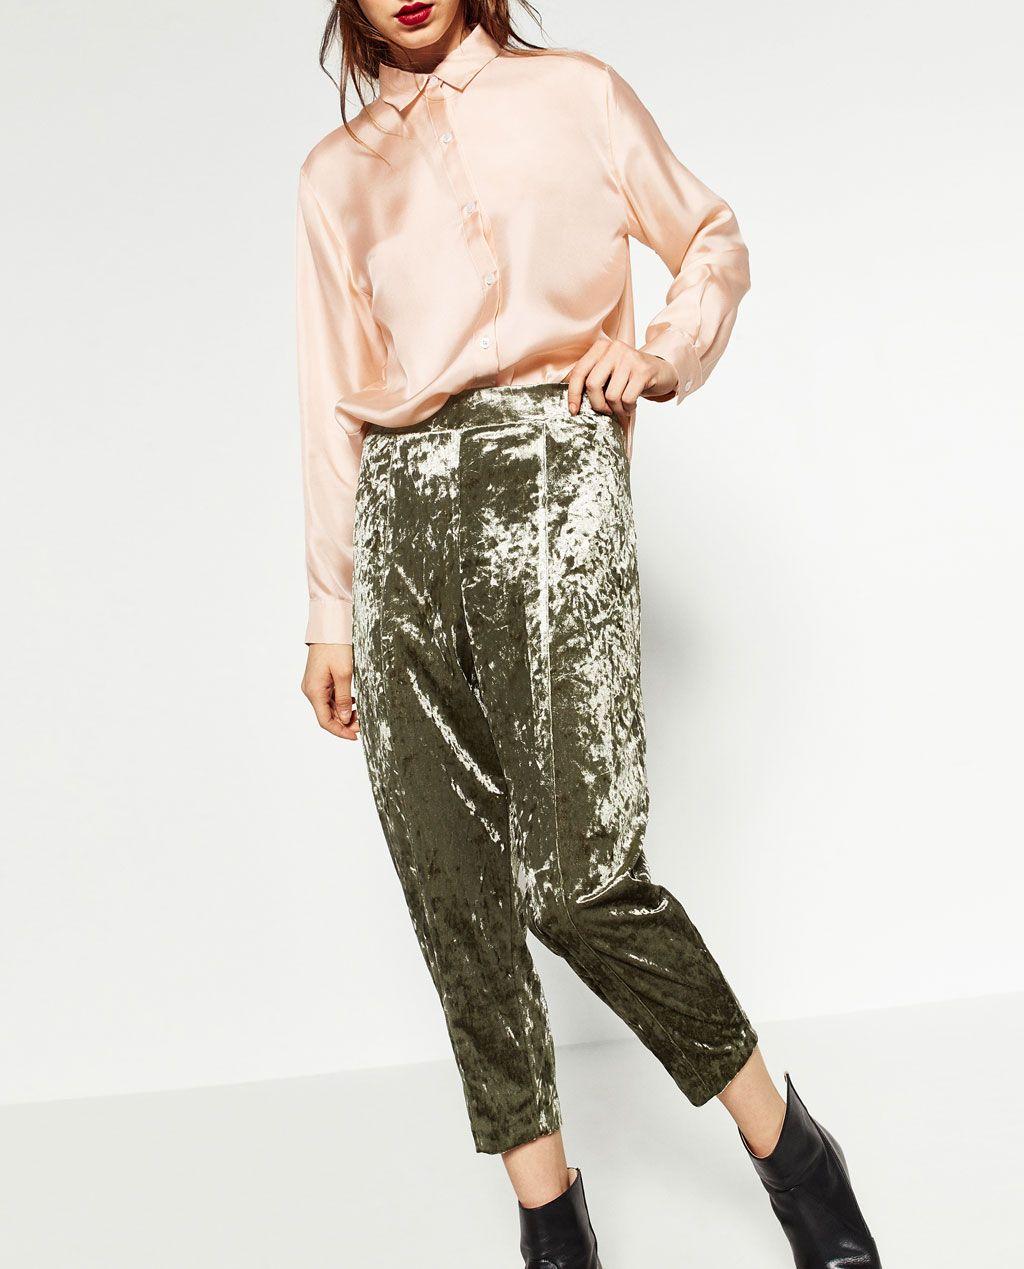 Pantalone Donna Carrot Zara Pantalone Pantalone Donna Carrot Zara Donna Carrot iTuwOkPZX